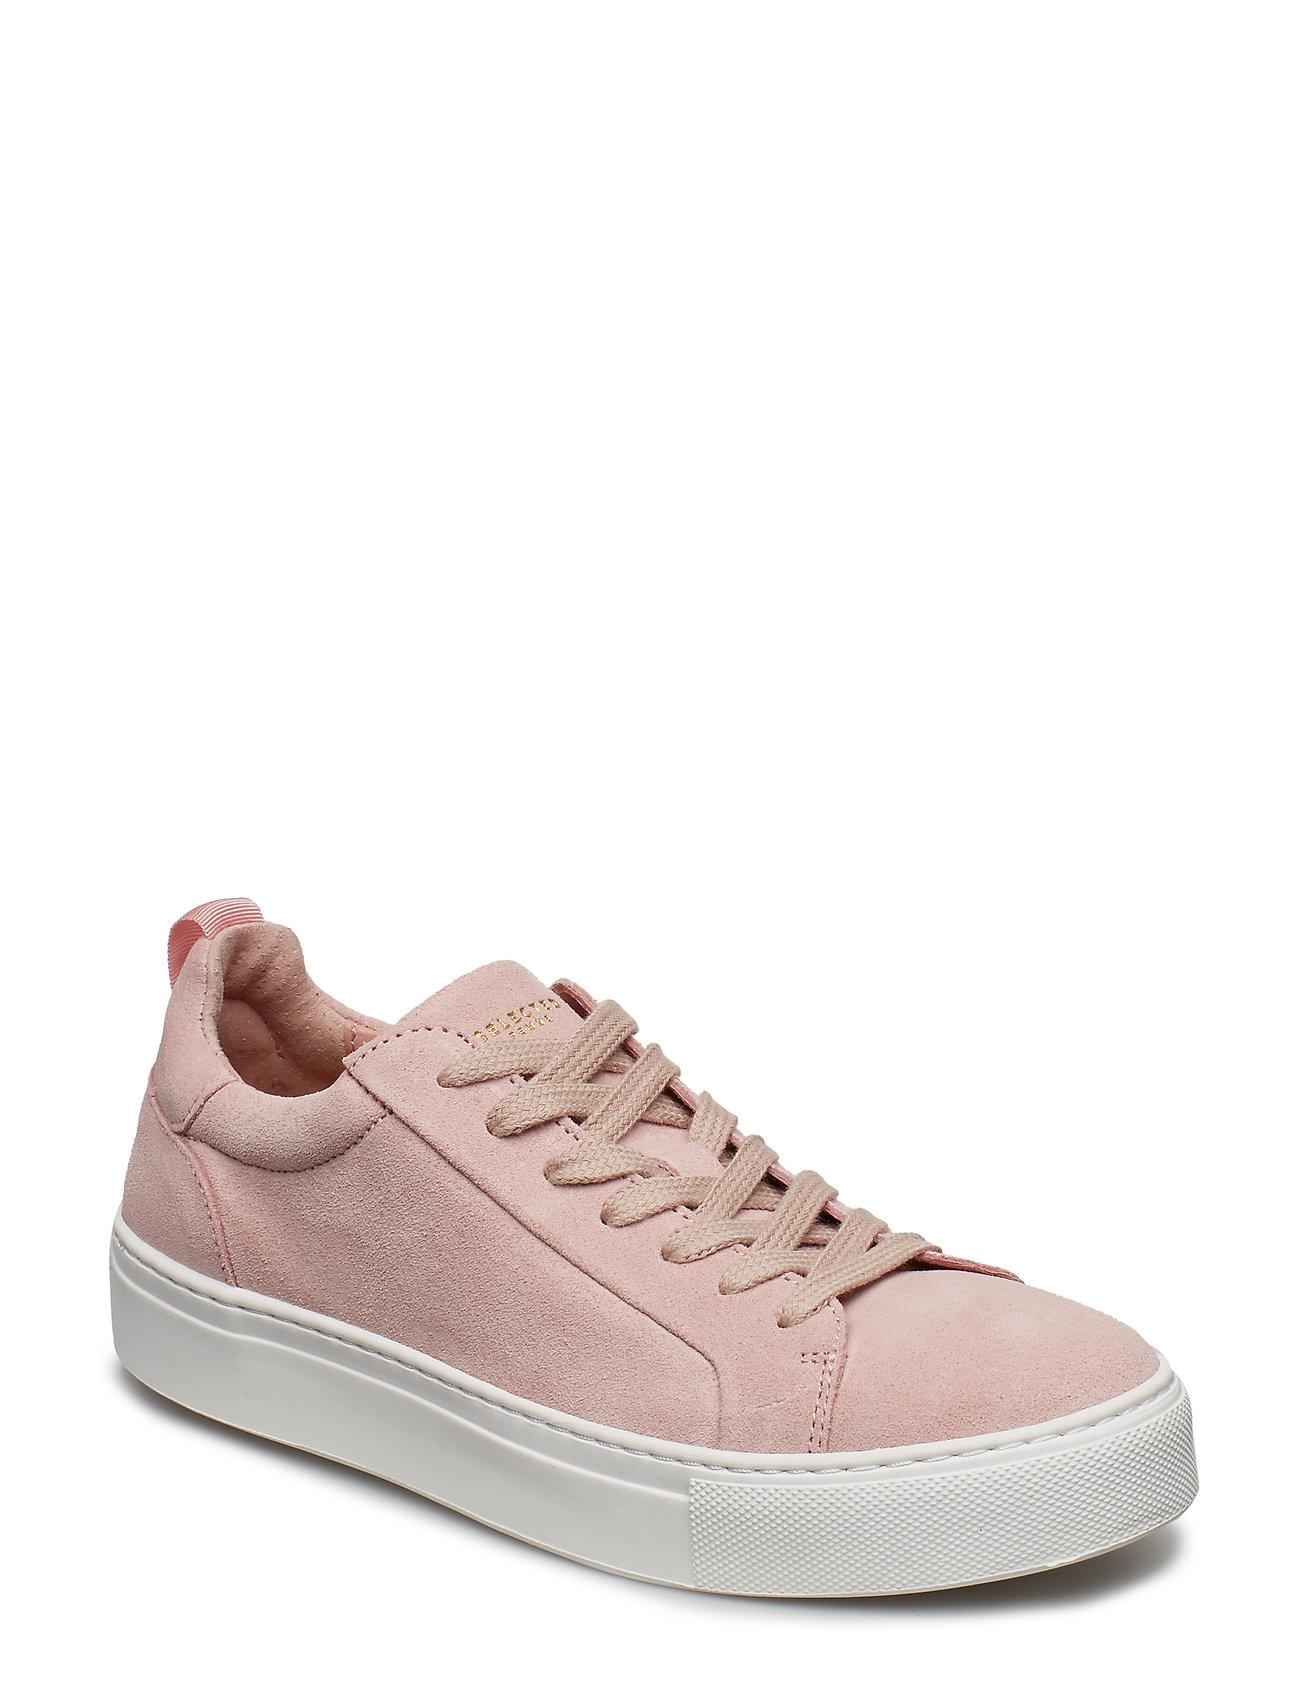 6bf930d902c Selected Femme Slfdonna Suede Trainer B (Heavenly Pink), (59.99 ...